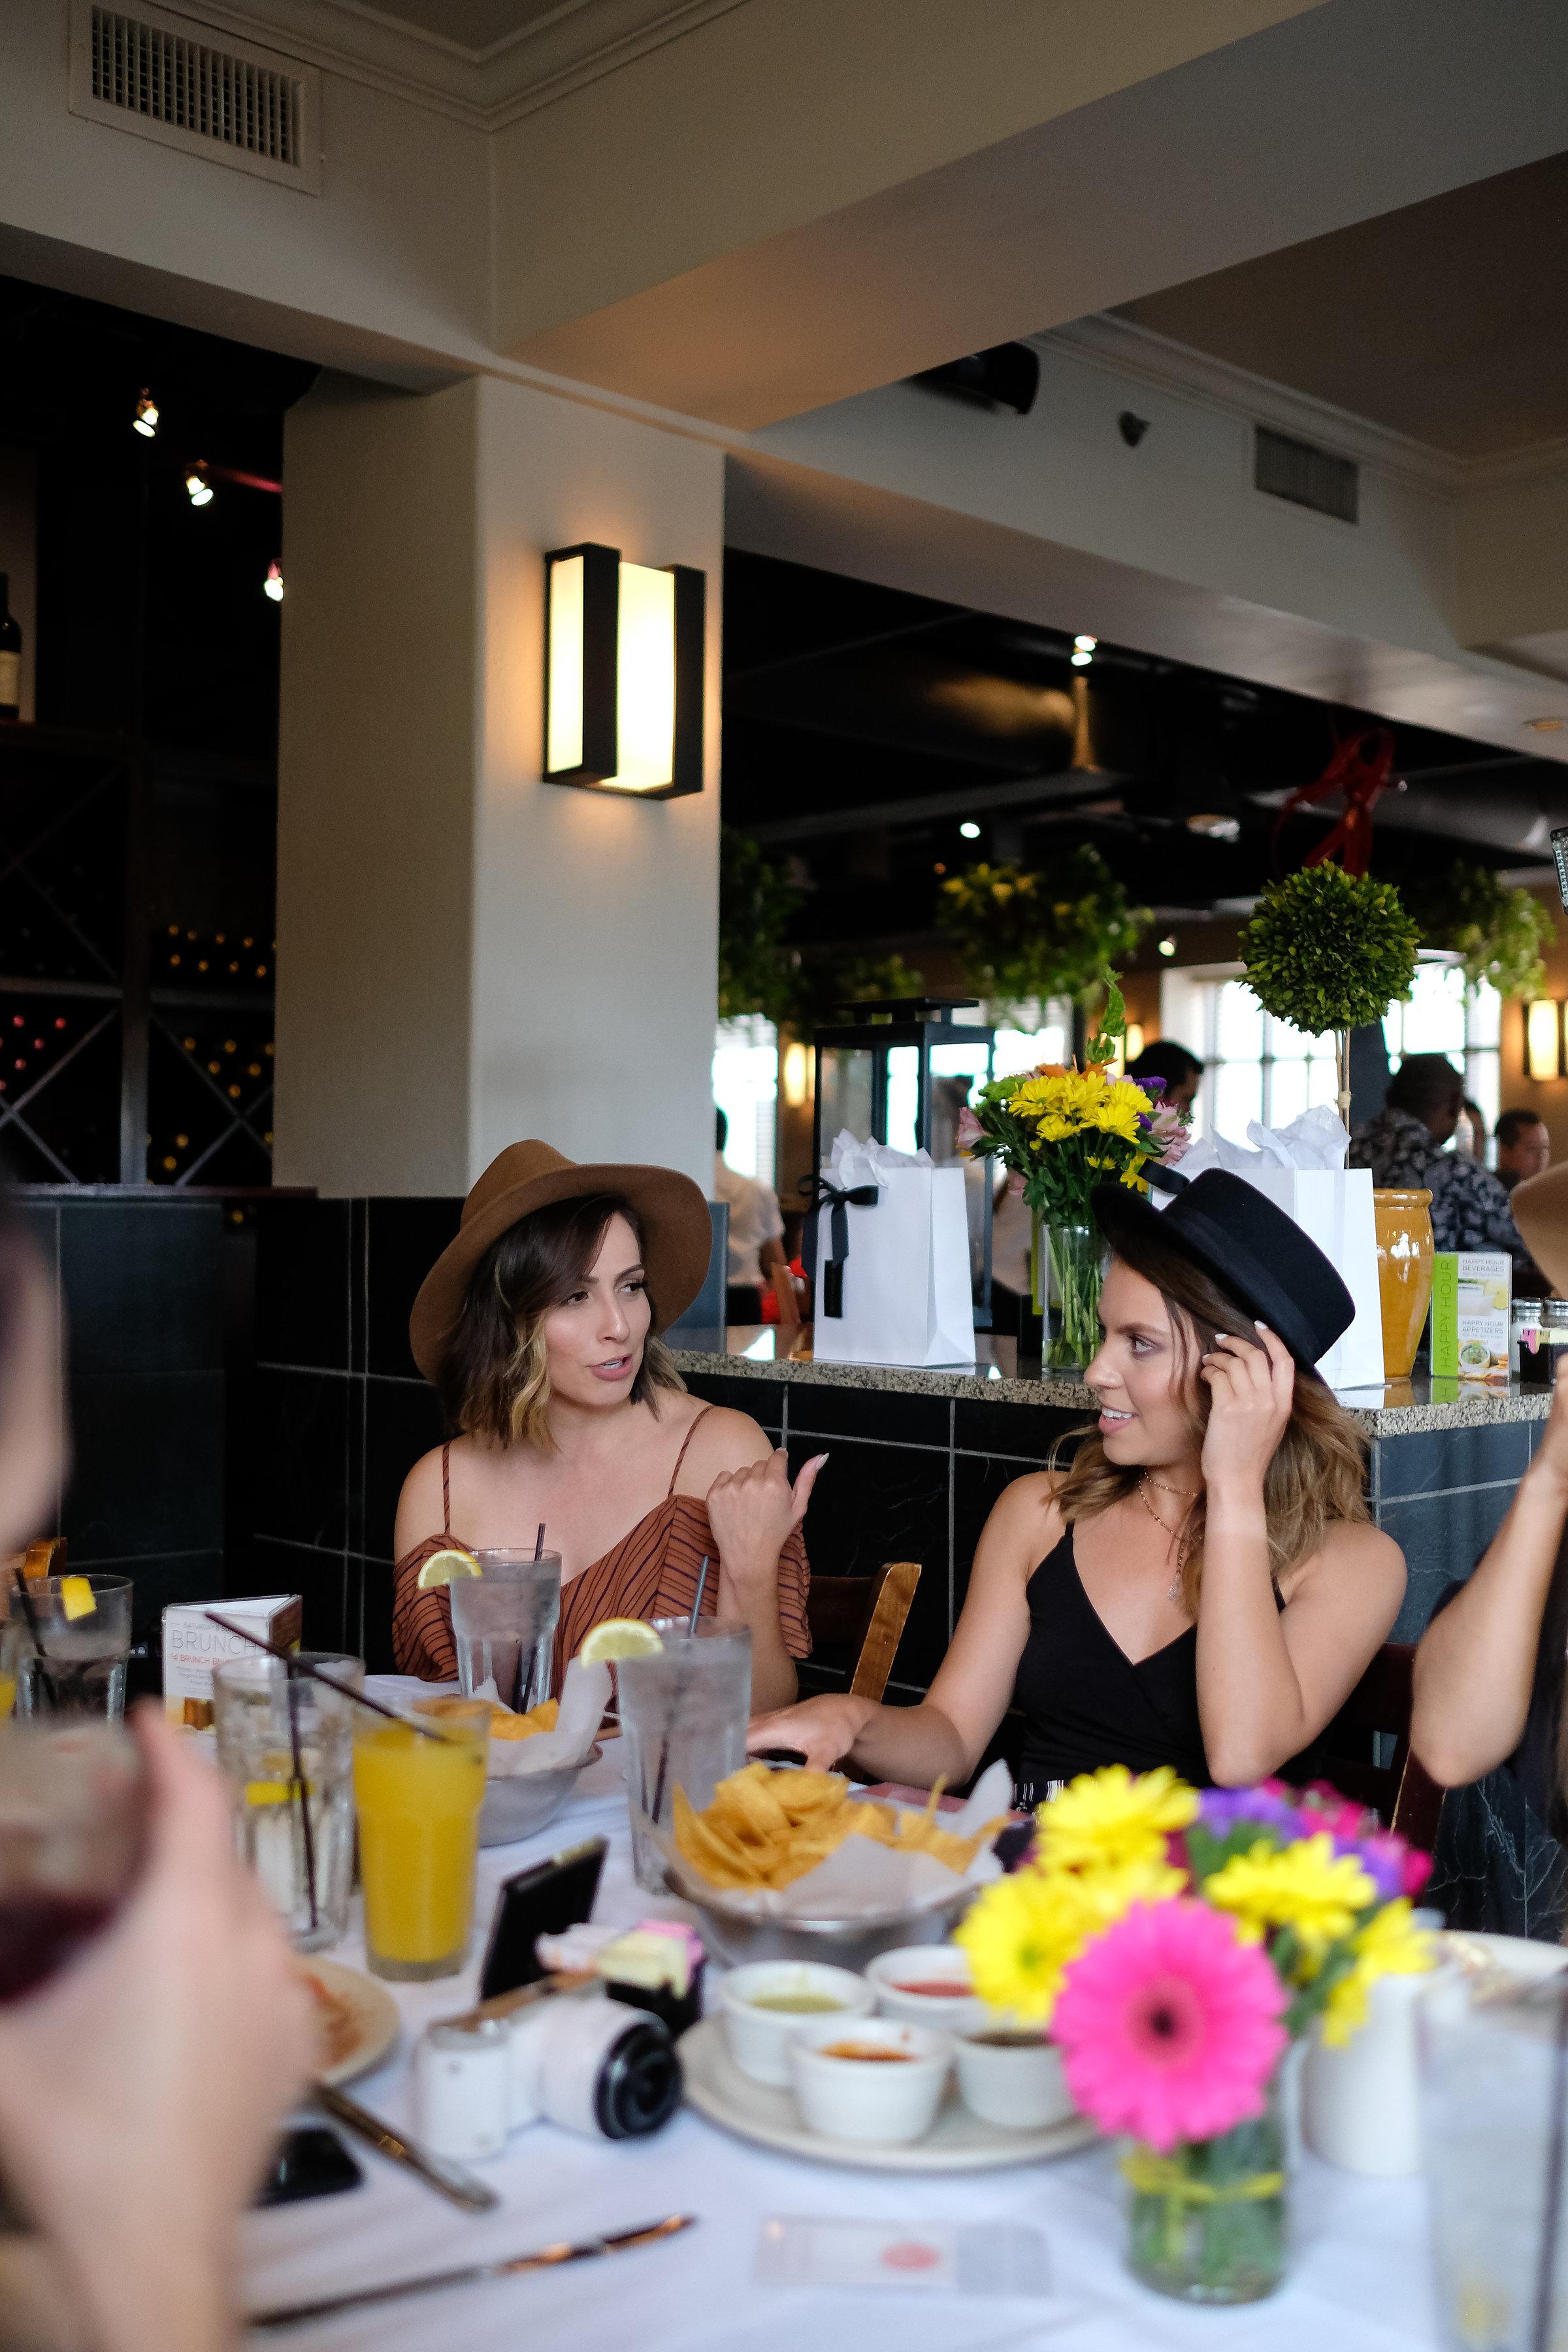 LatinaBloggerBrunch_0131.jpg